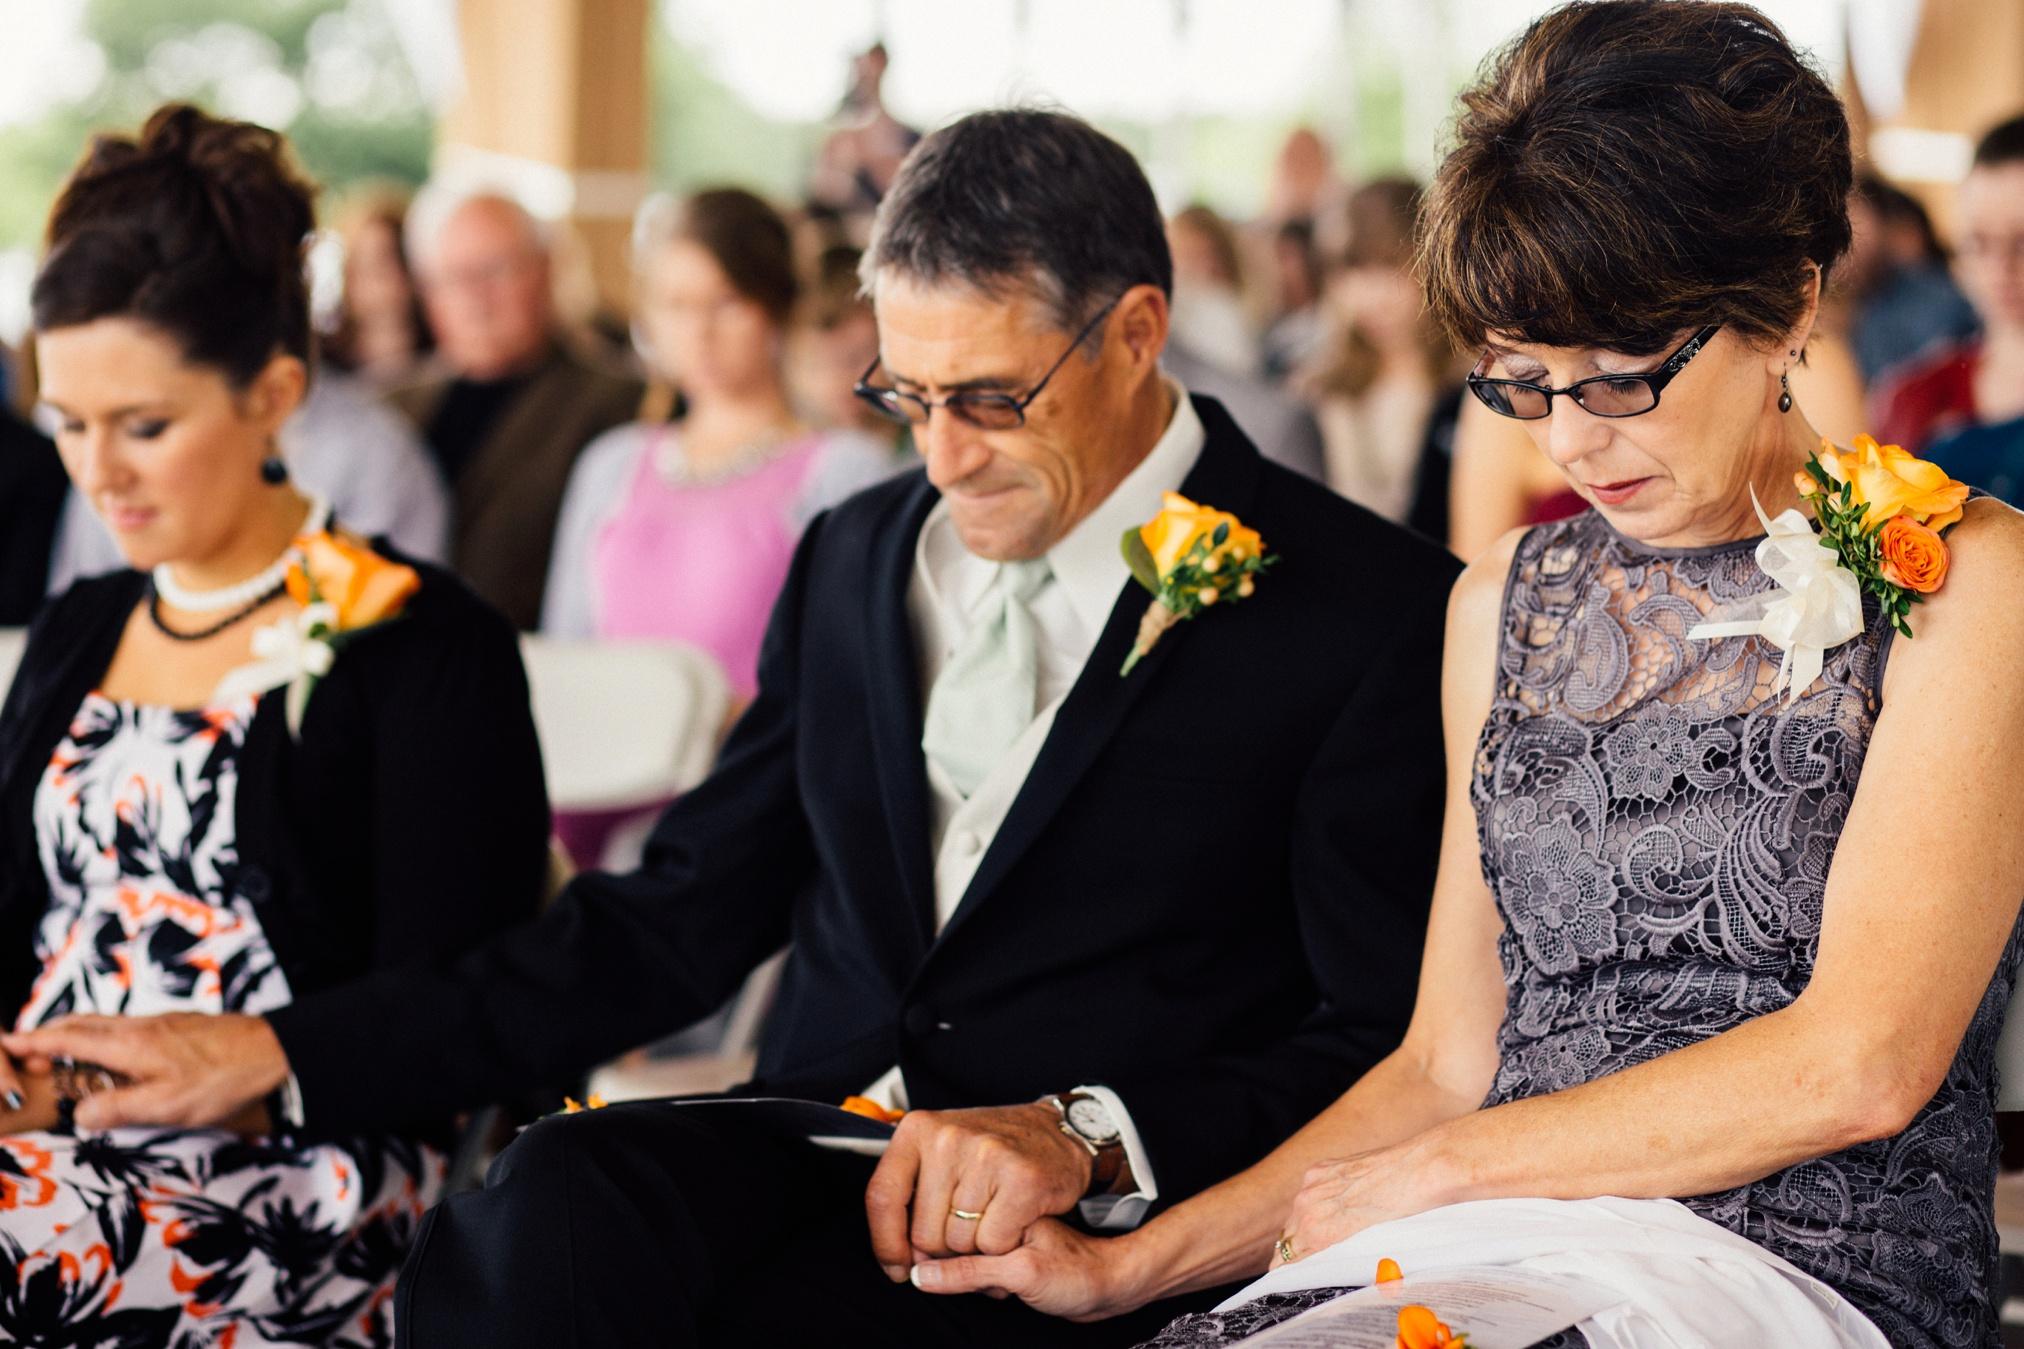 schmid_wedding-412.jpg